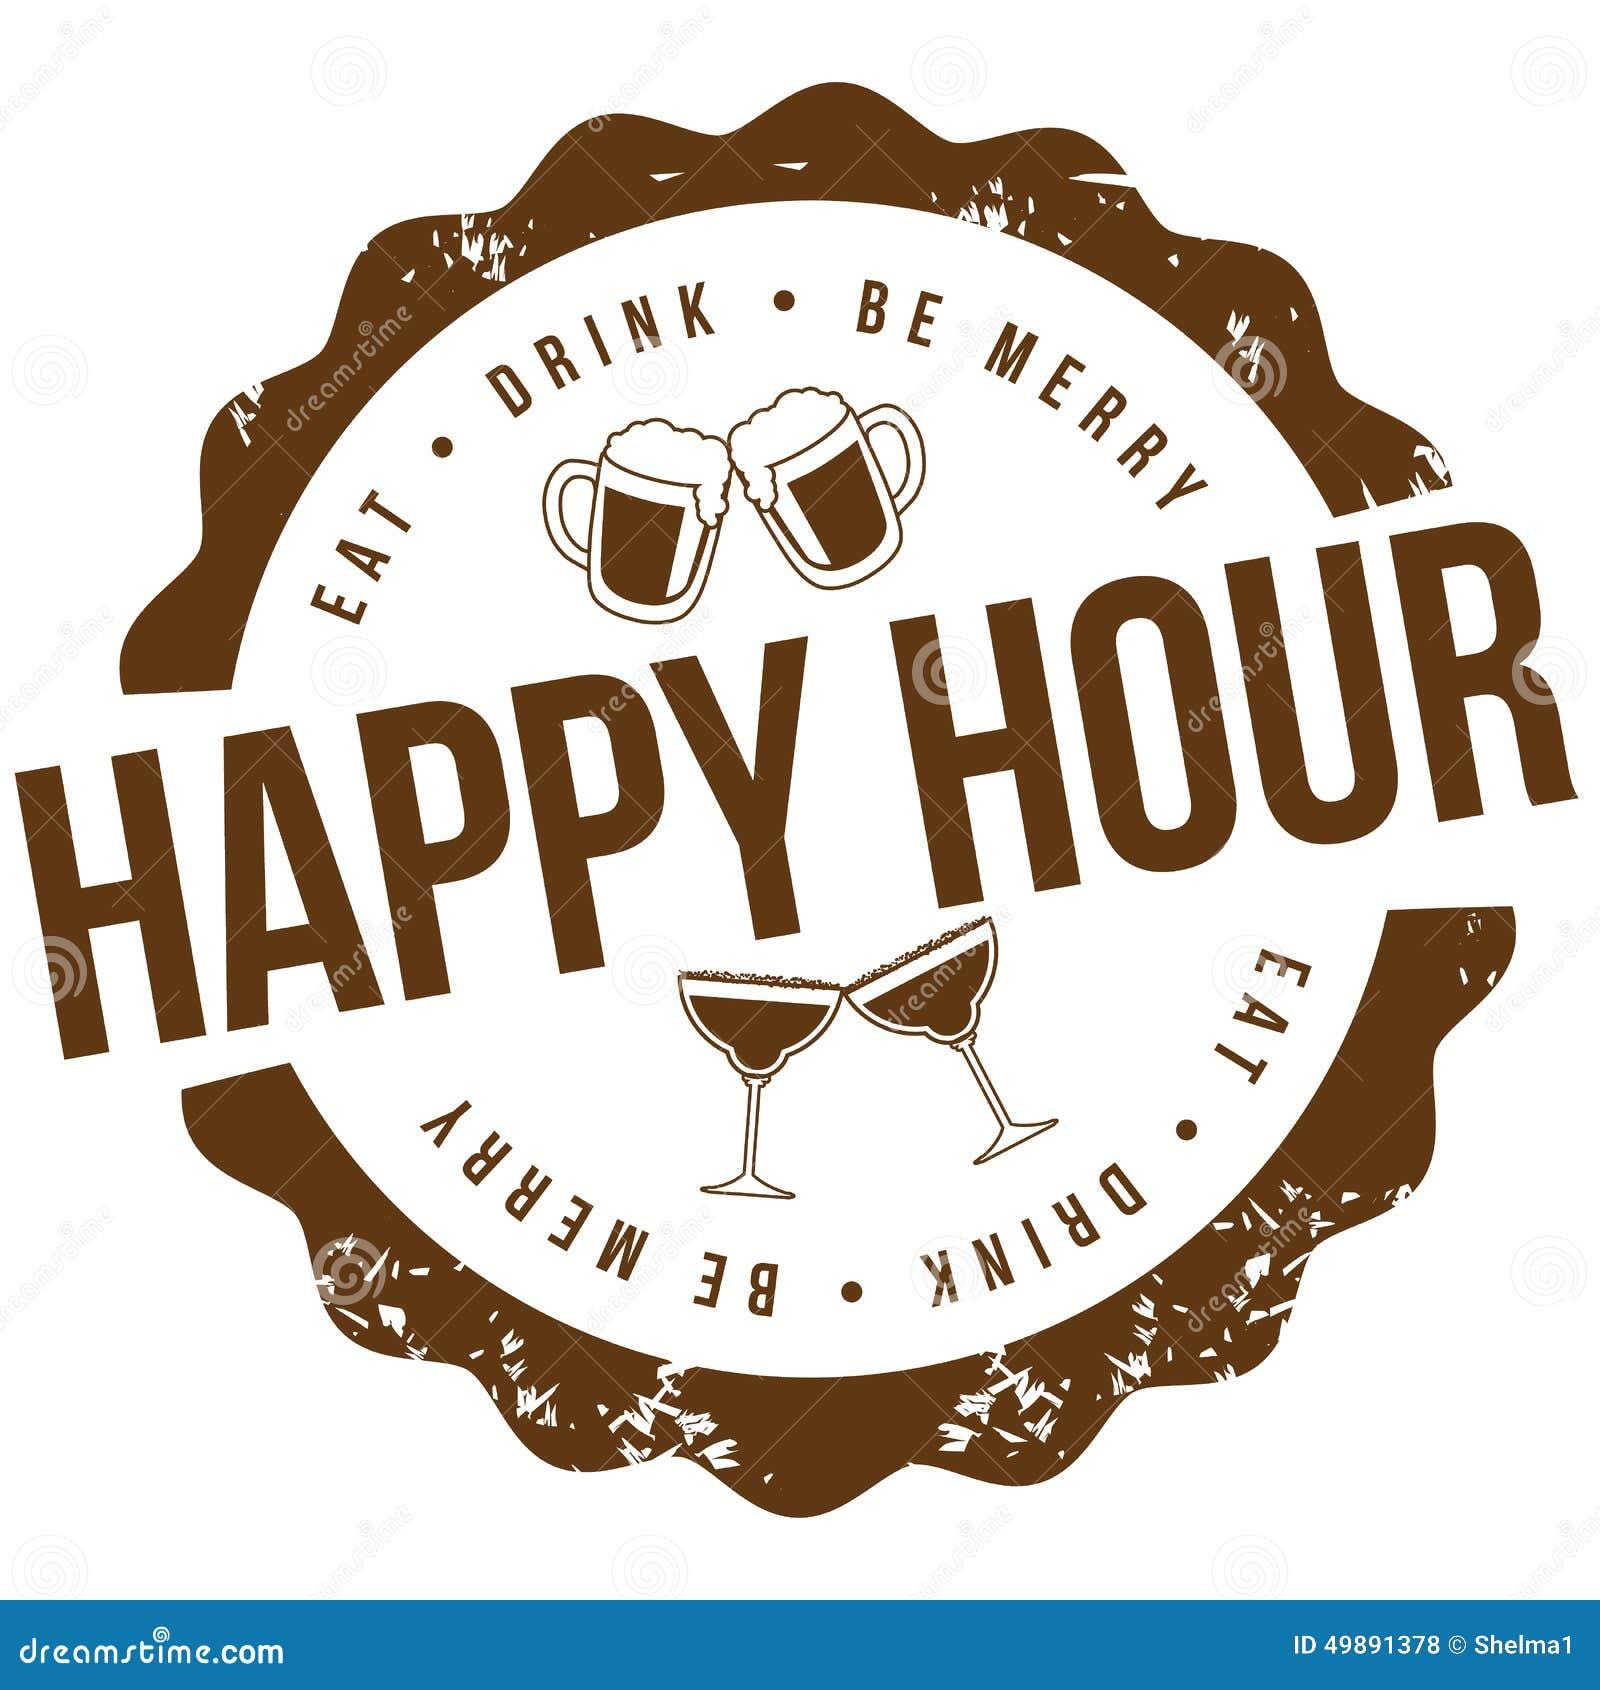 Happy hour stamp EPS 10 vector